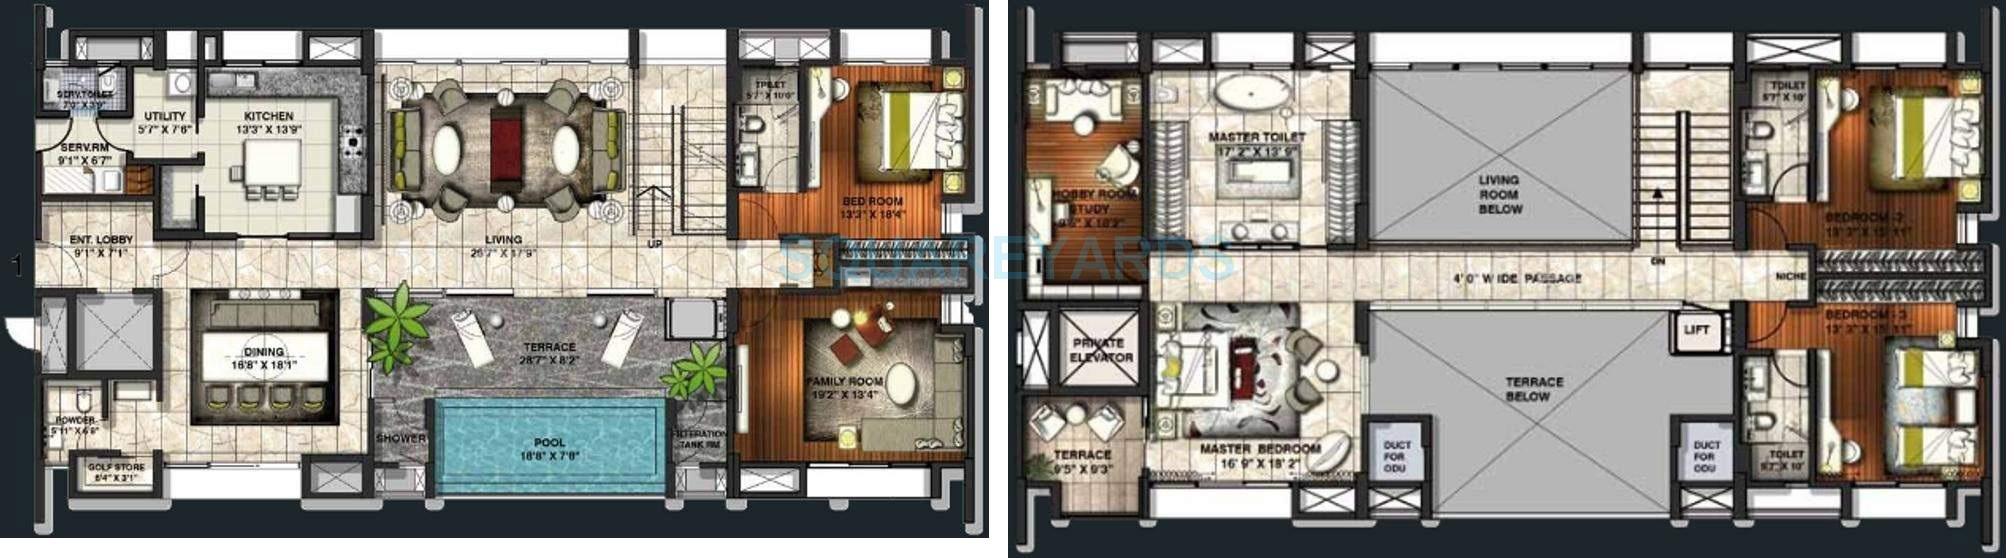 lodha belmondo apartment 4bhk 5700sqft1